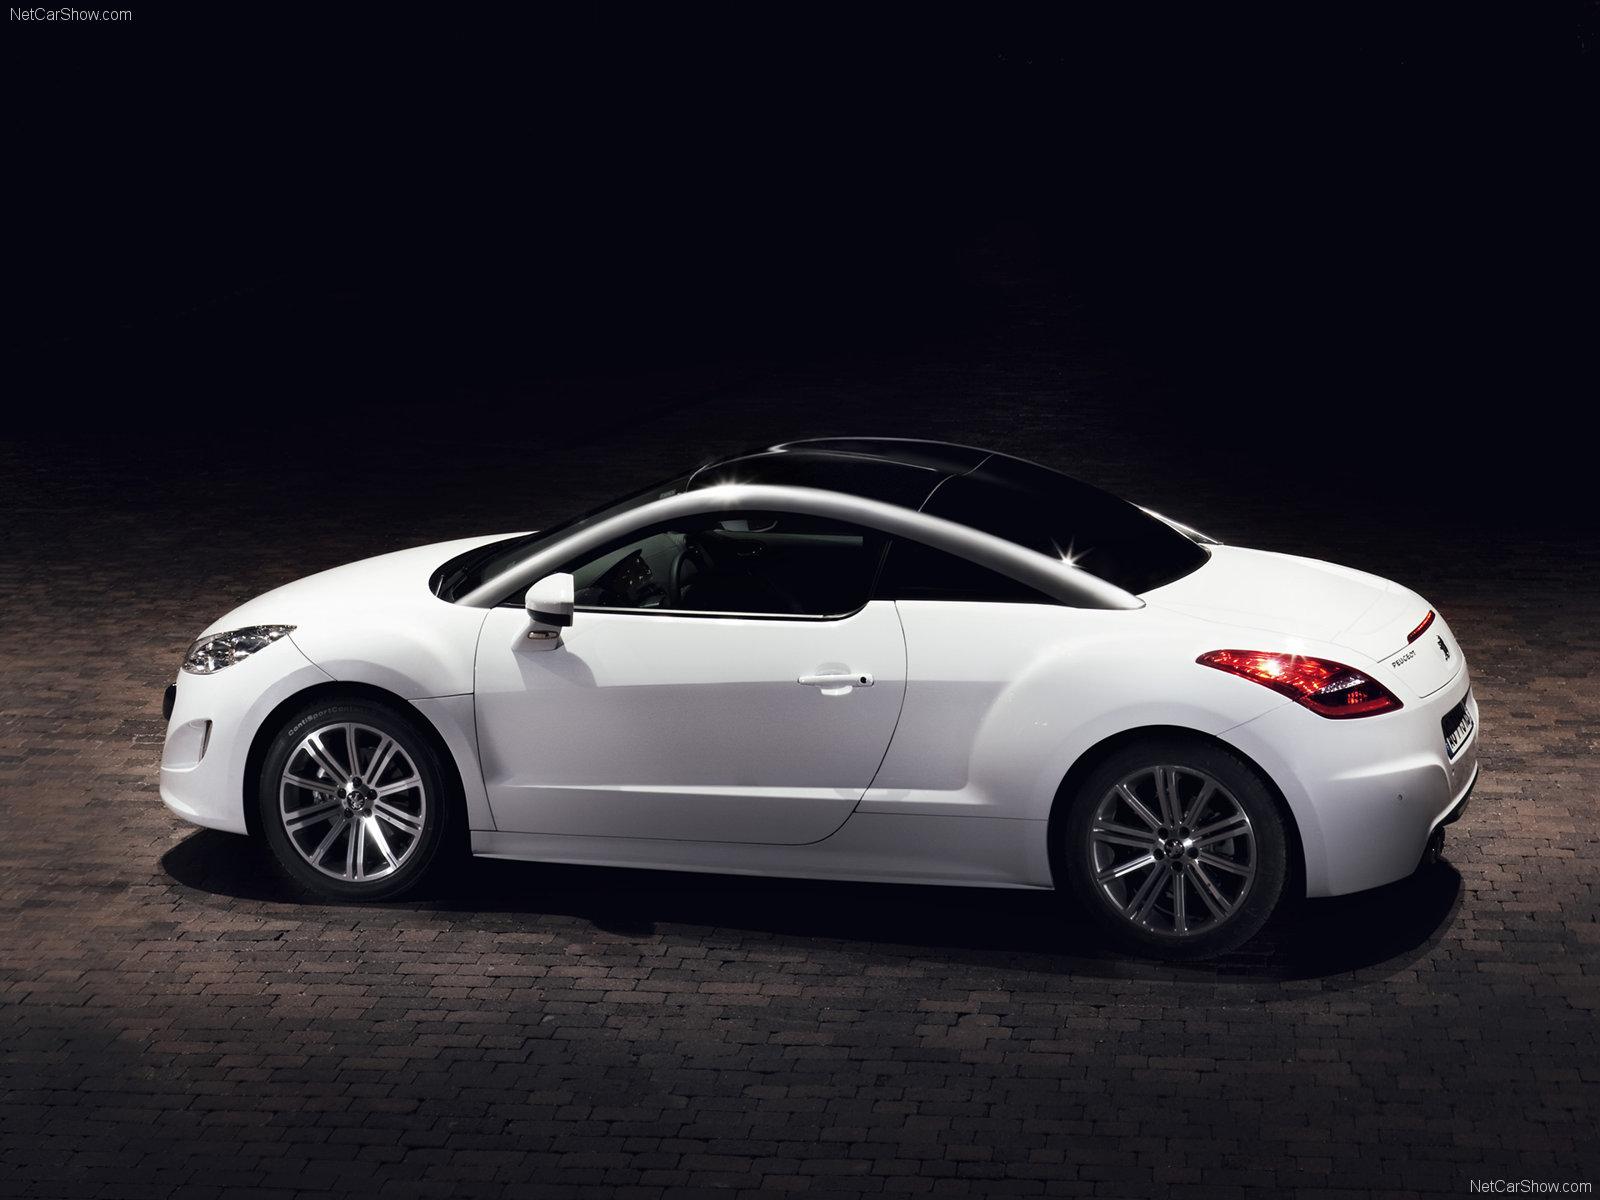 Peugeot RCZ photos - PhotoGallery with 59 pics| CarsBase.com